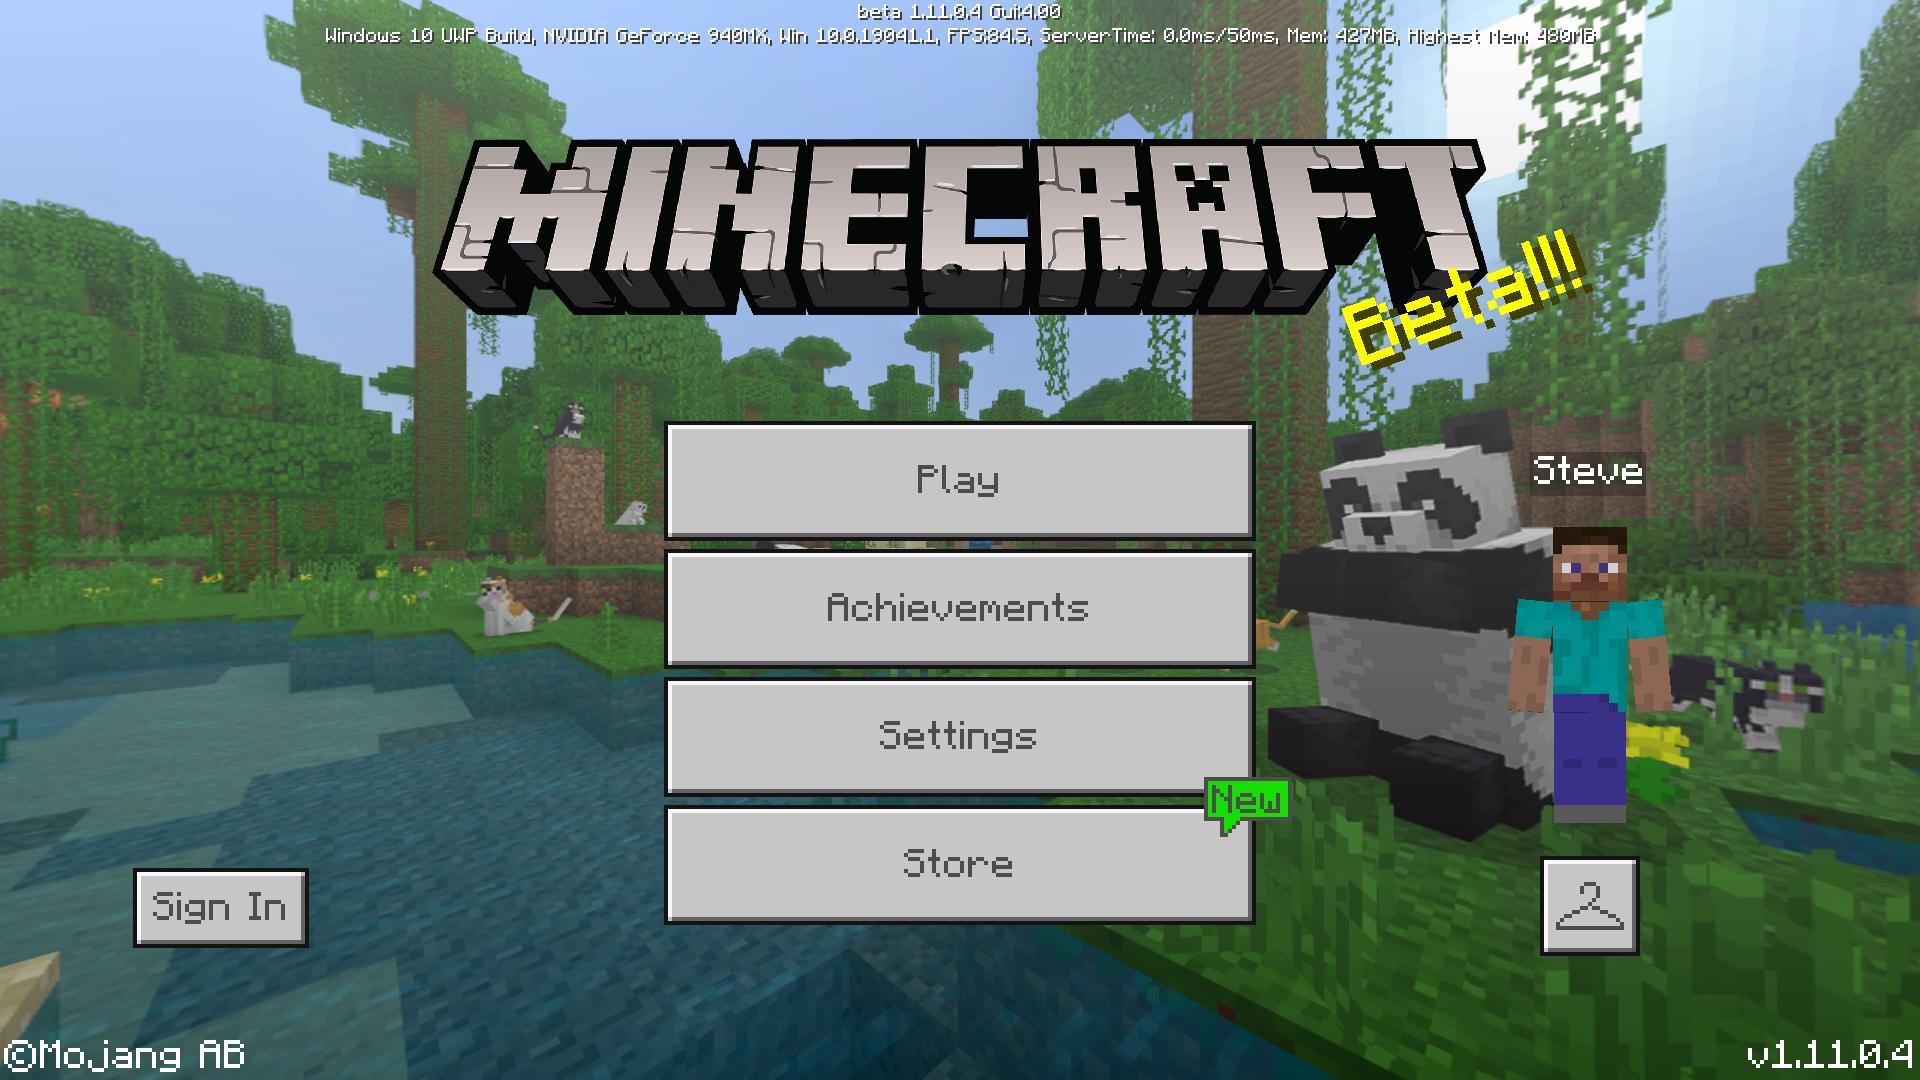 Bedrock Edition beta 1 11 0 4 Official Minecraft Wiki